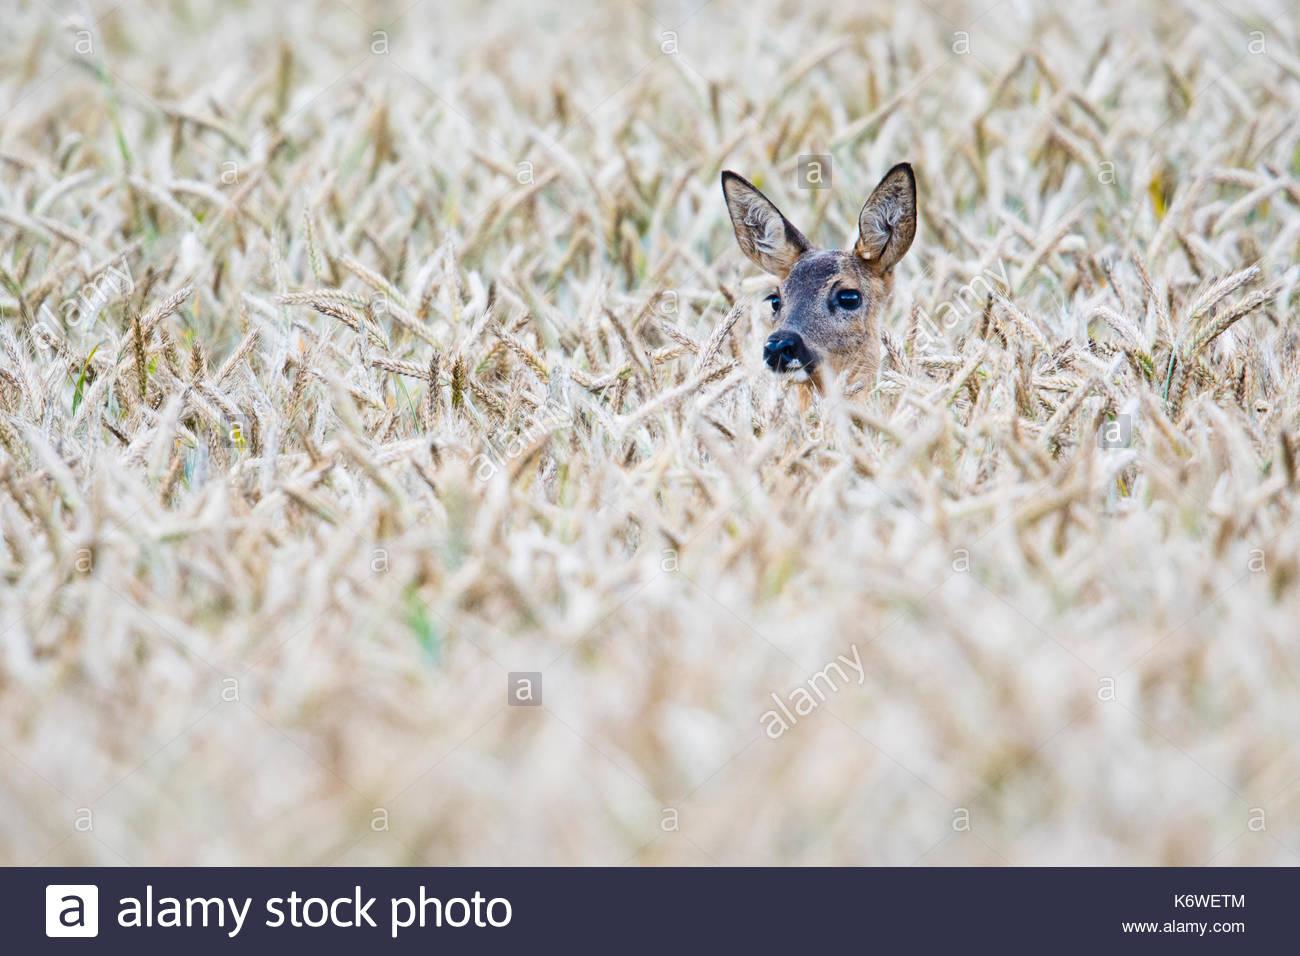 European roe deer (Capreolus capreolus) in corn field, Emsland, Lower Saxony, Germany - Stock Image